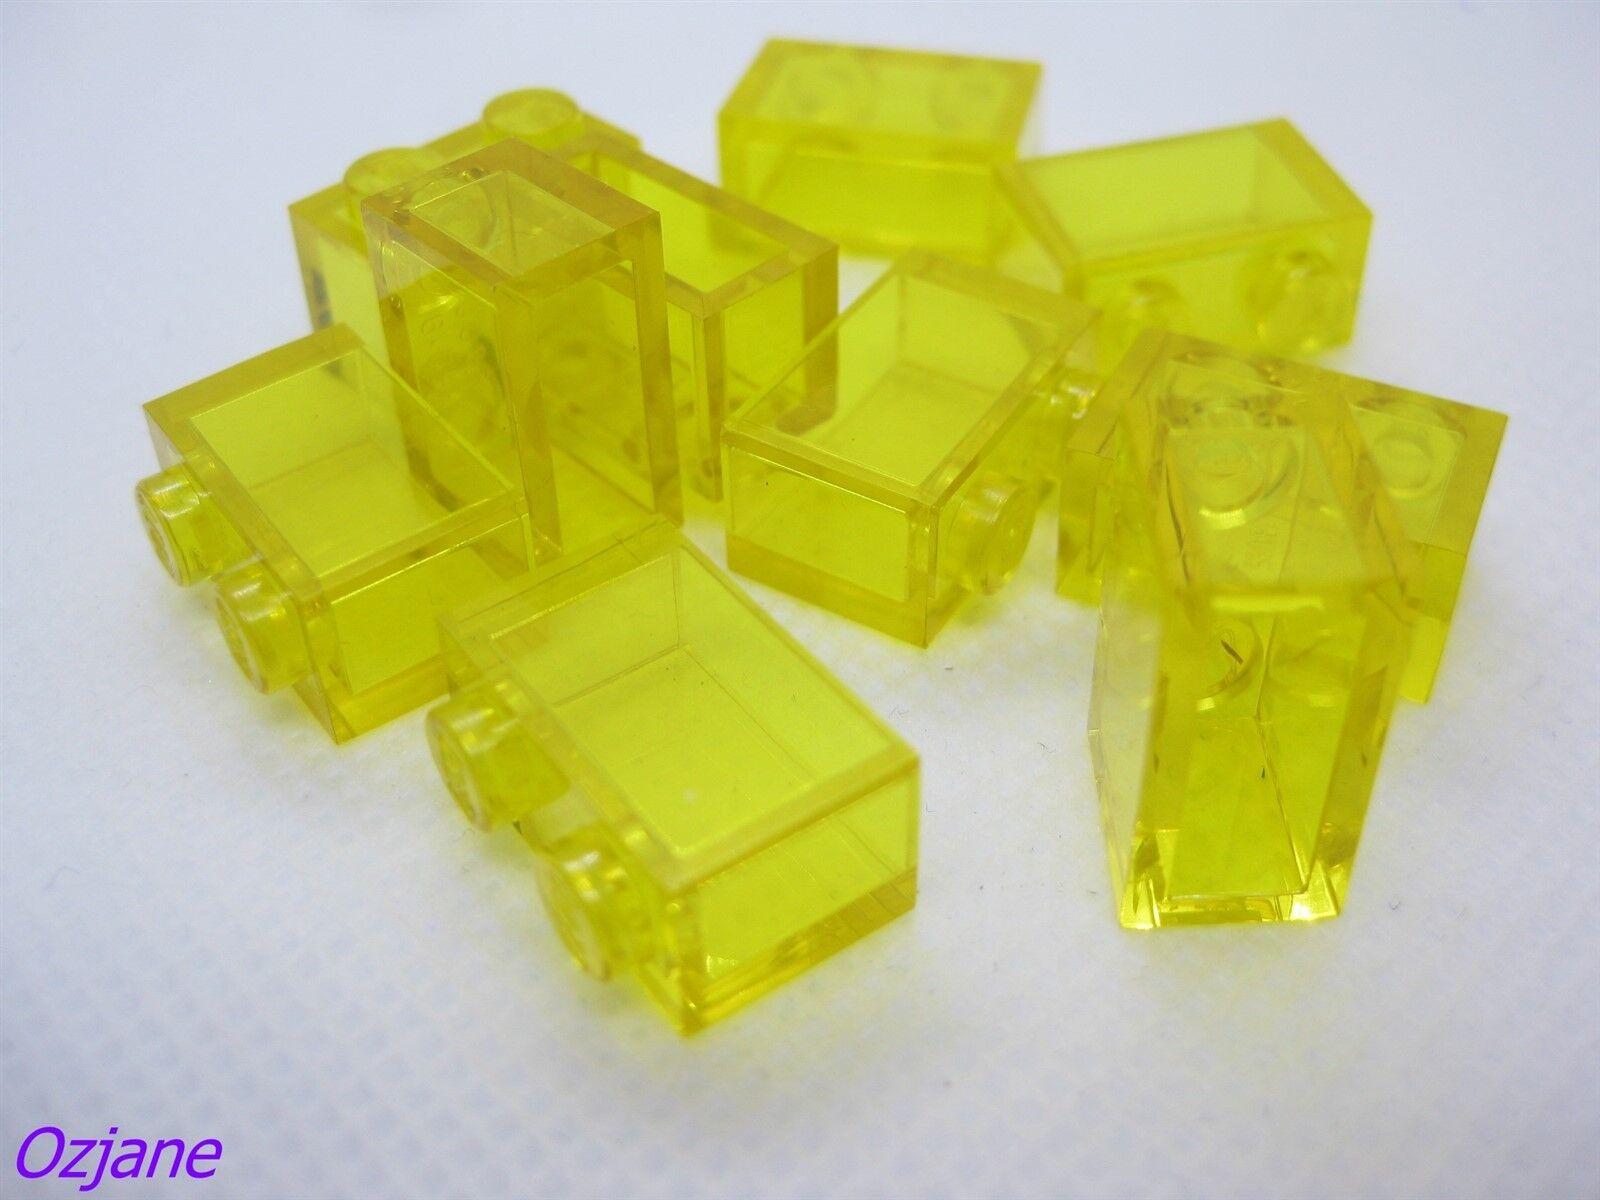 6x brick brick 1x2 2x1 transparent//trans clear 3065 new Lego